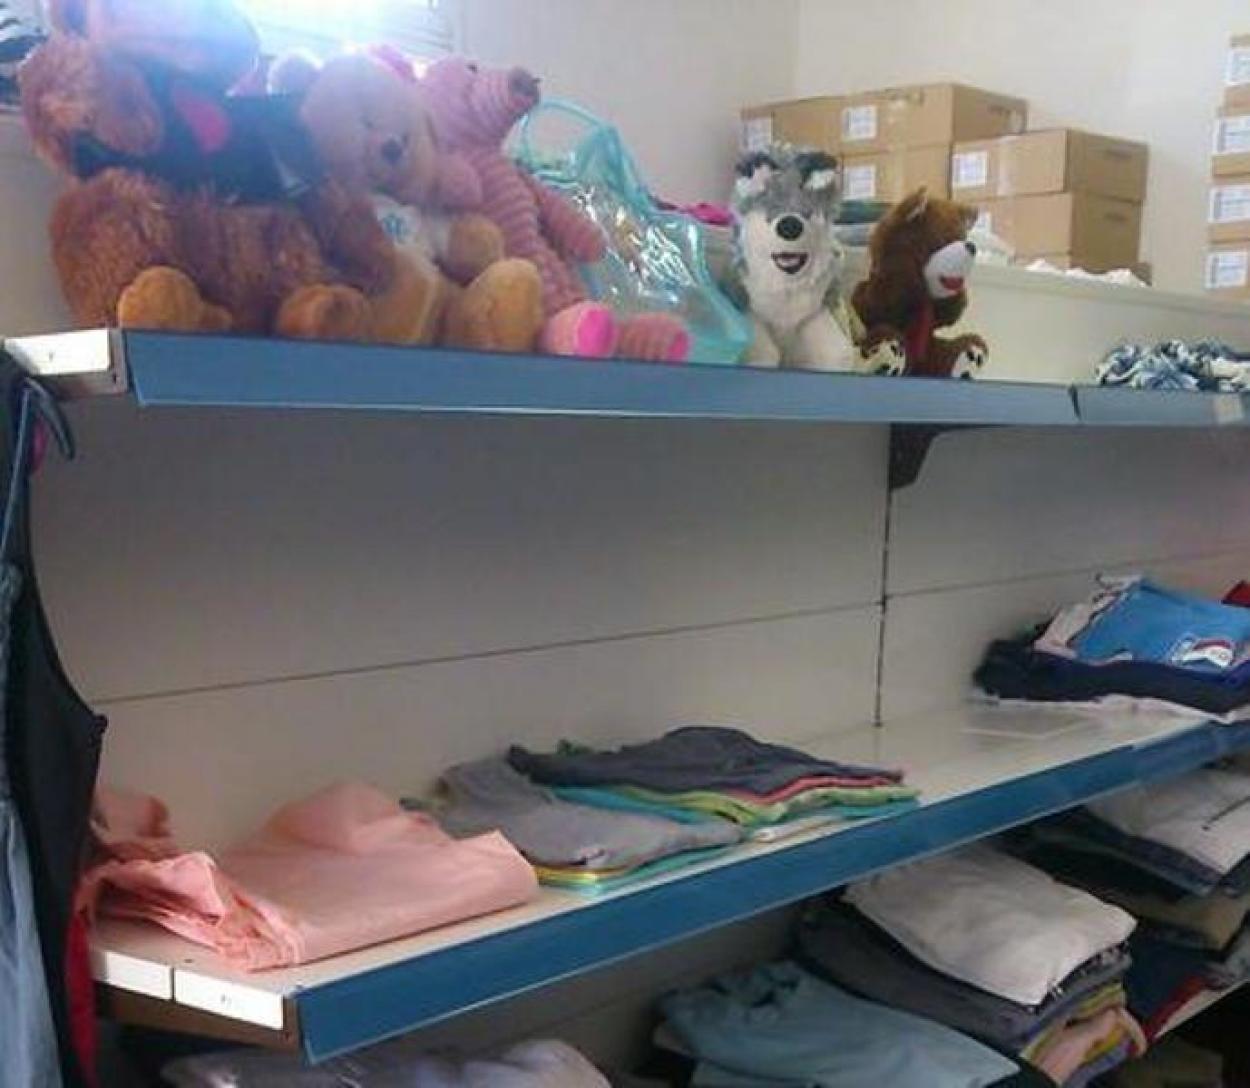 81a8e99e730 Ετικέτες: Κοινωνικό · Παντοπωλείο · Δήμου Αλεξάνδρειας · συλλογή · βρεφικά  · παιδικά · είδη · εφηβικά · ρούχα · παπούτσια